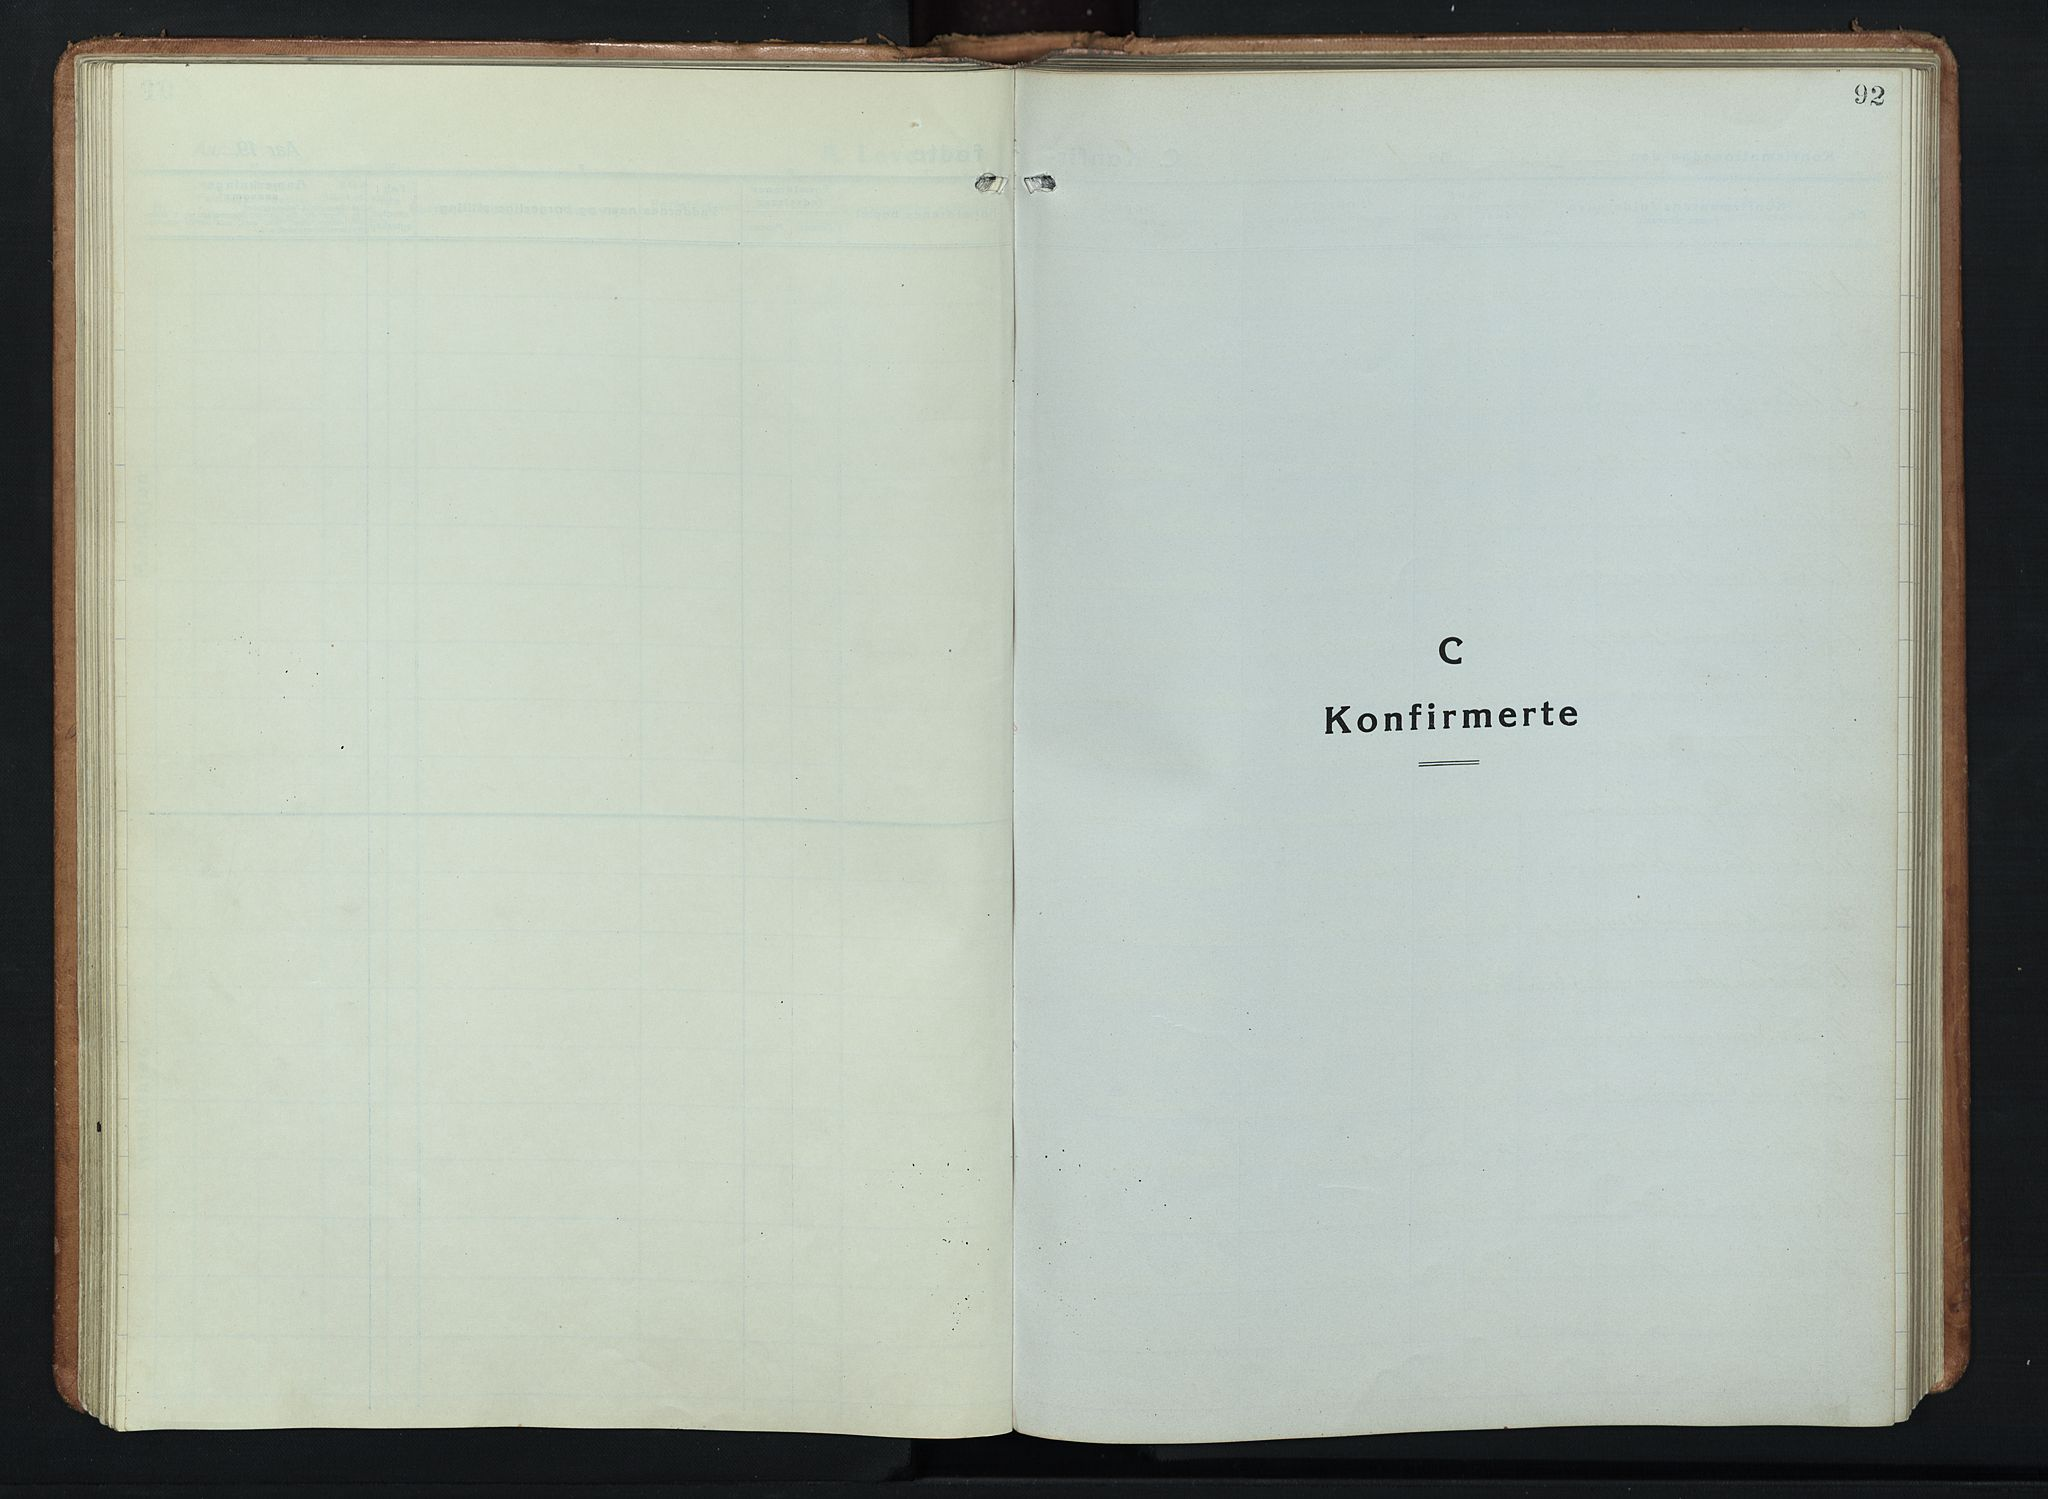 SAH, Ringebu prestekontor, Klokkerbok nr. 11, 1921-1943, s. 92